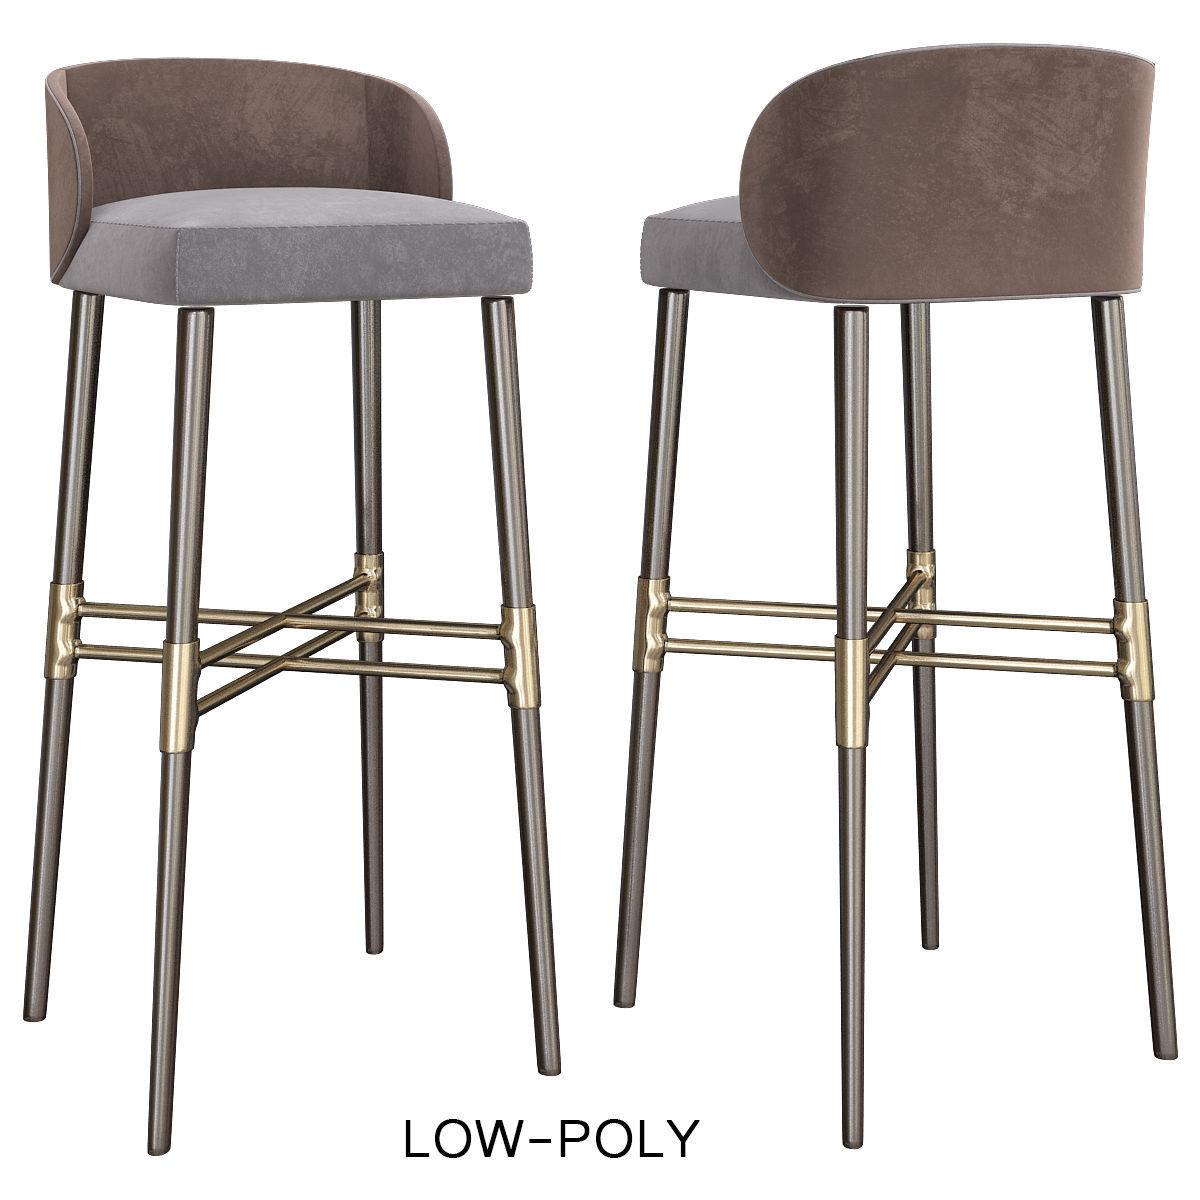 Terrific Bar Stool Minotti Low Poly 3D Model 3D Model Machost Co Dining Chair Design Ideas Machostcouk